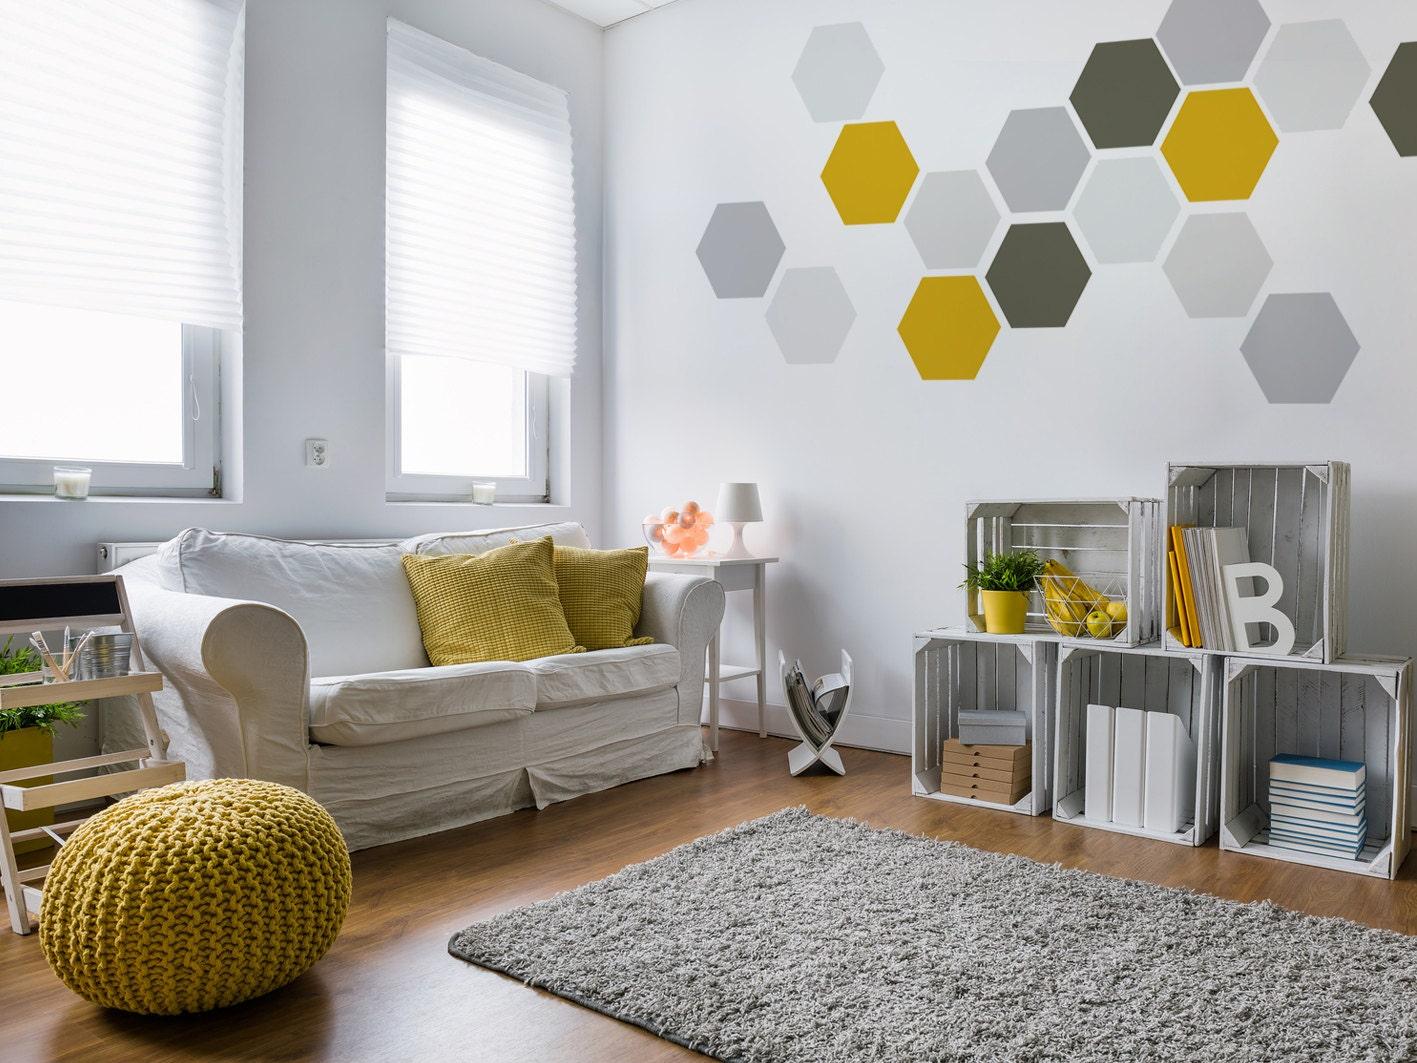 Geometric Removable Wall Art Wallpaper Fabric-like Stickers